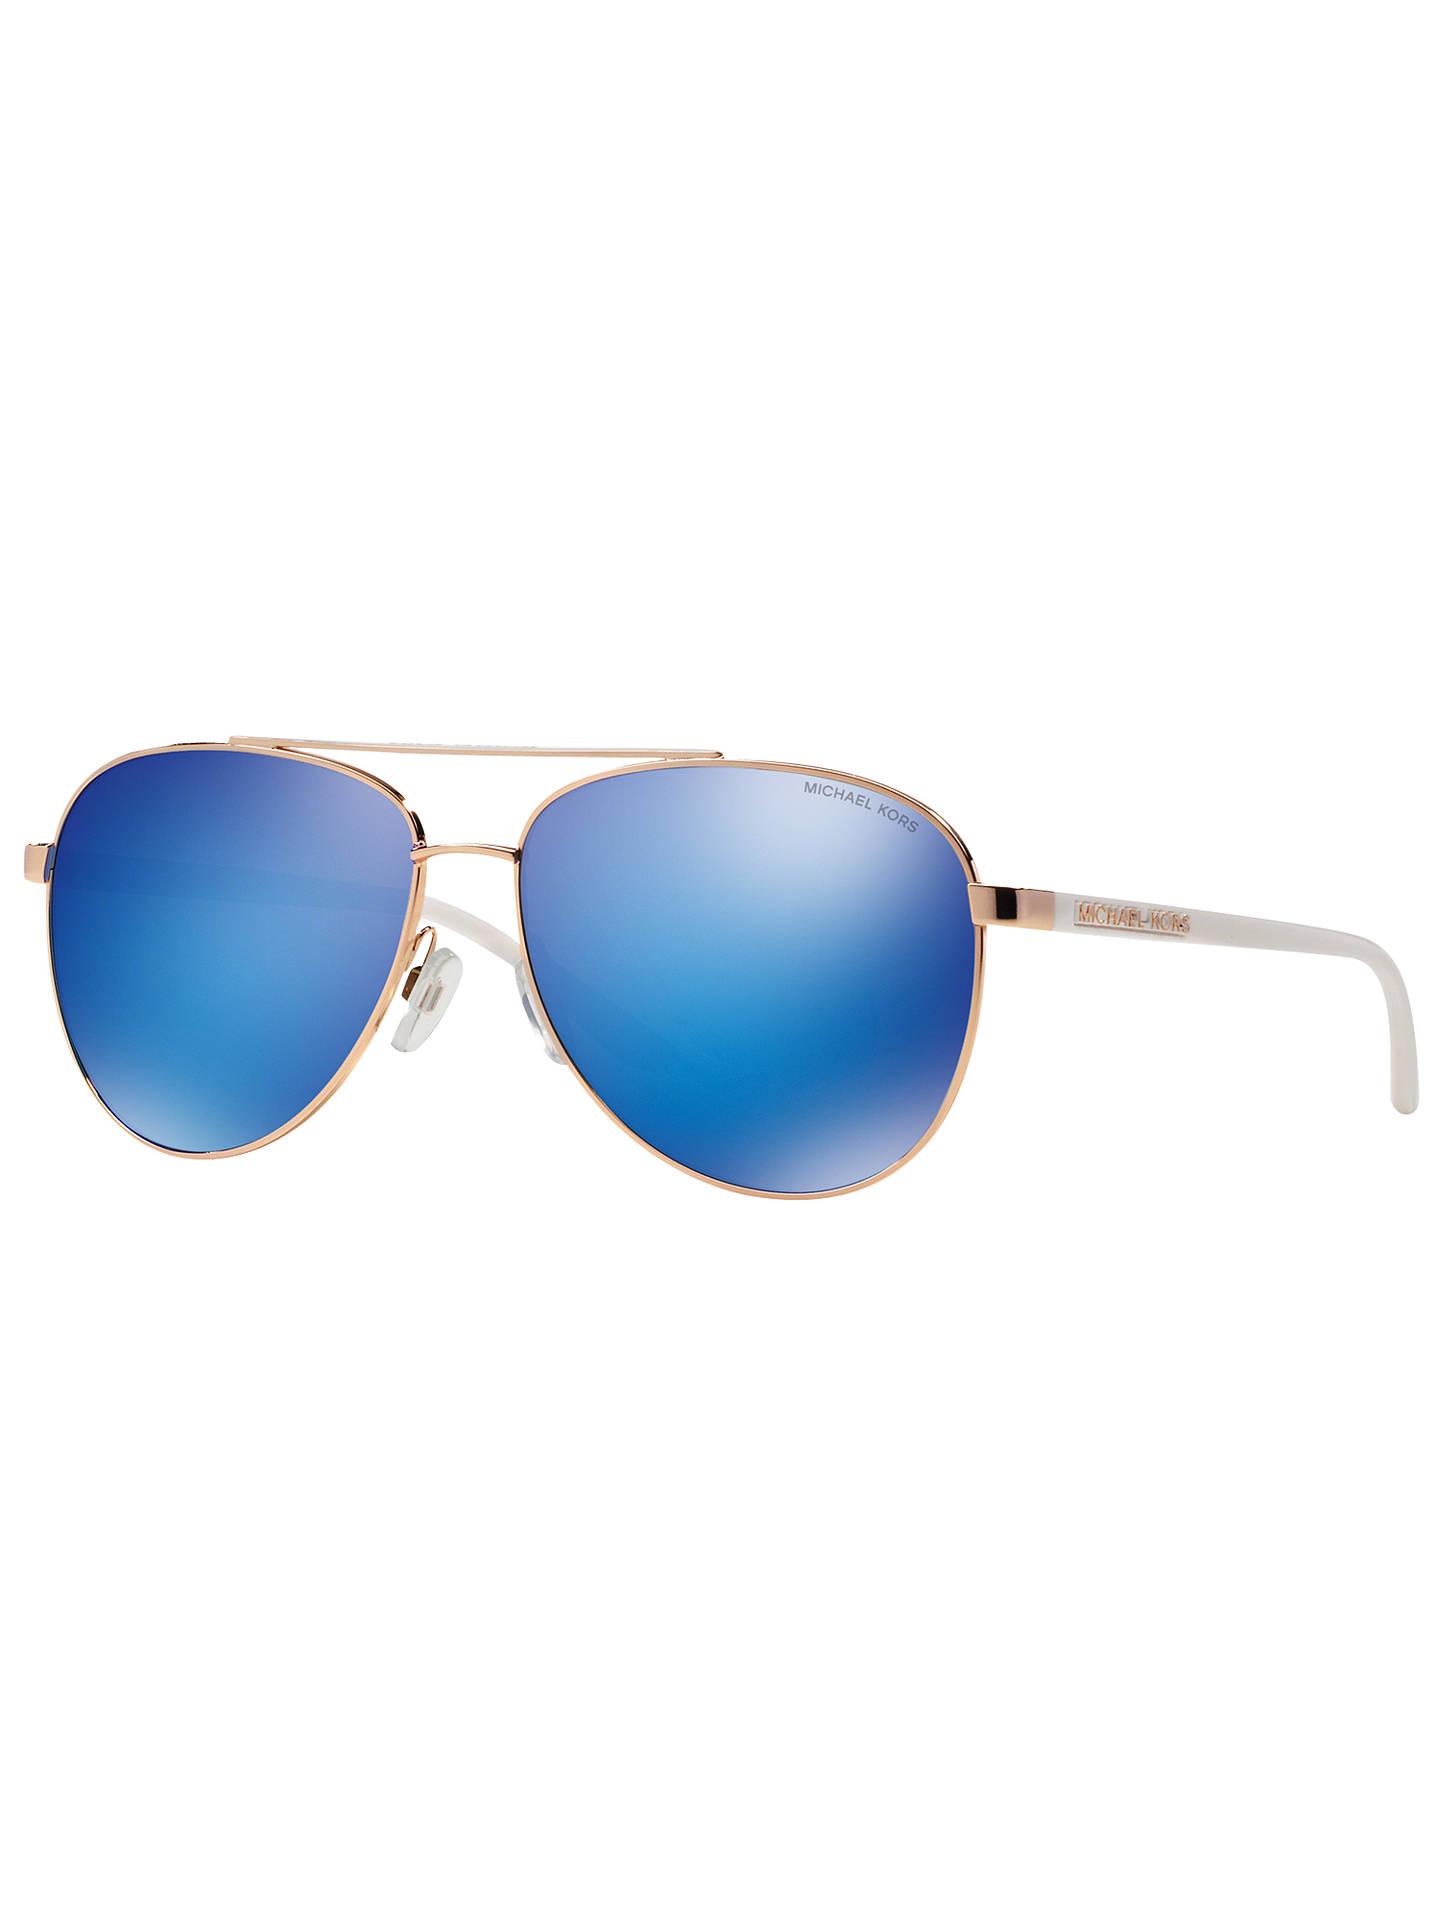 b81de7308ec4 Buy Michael Kors MK5007 Hvar I Aviator Sunglasses, Rose Gold/Blue Mirror  Online at ...